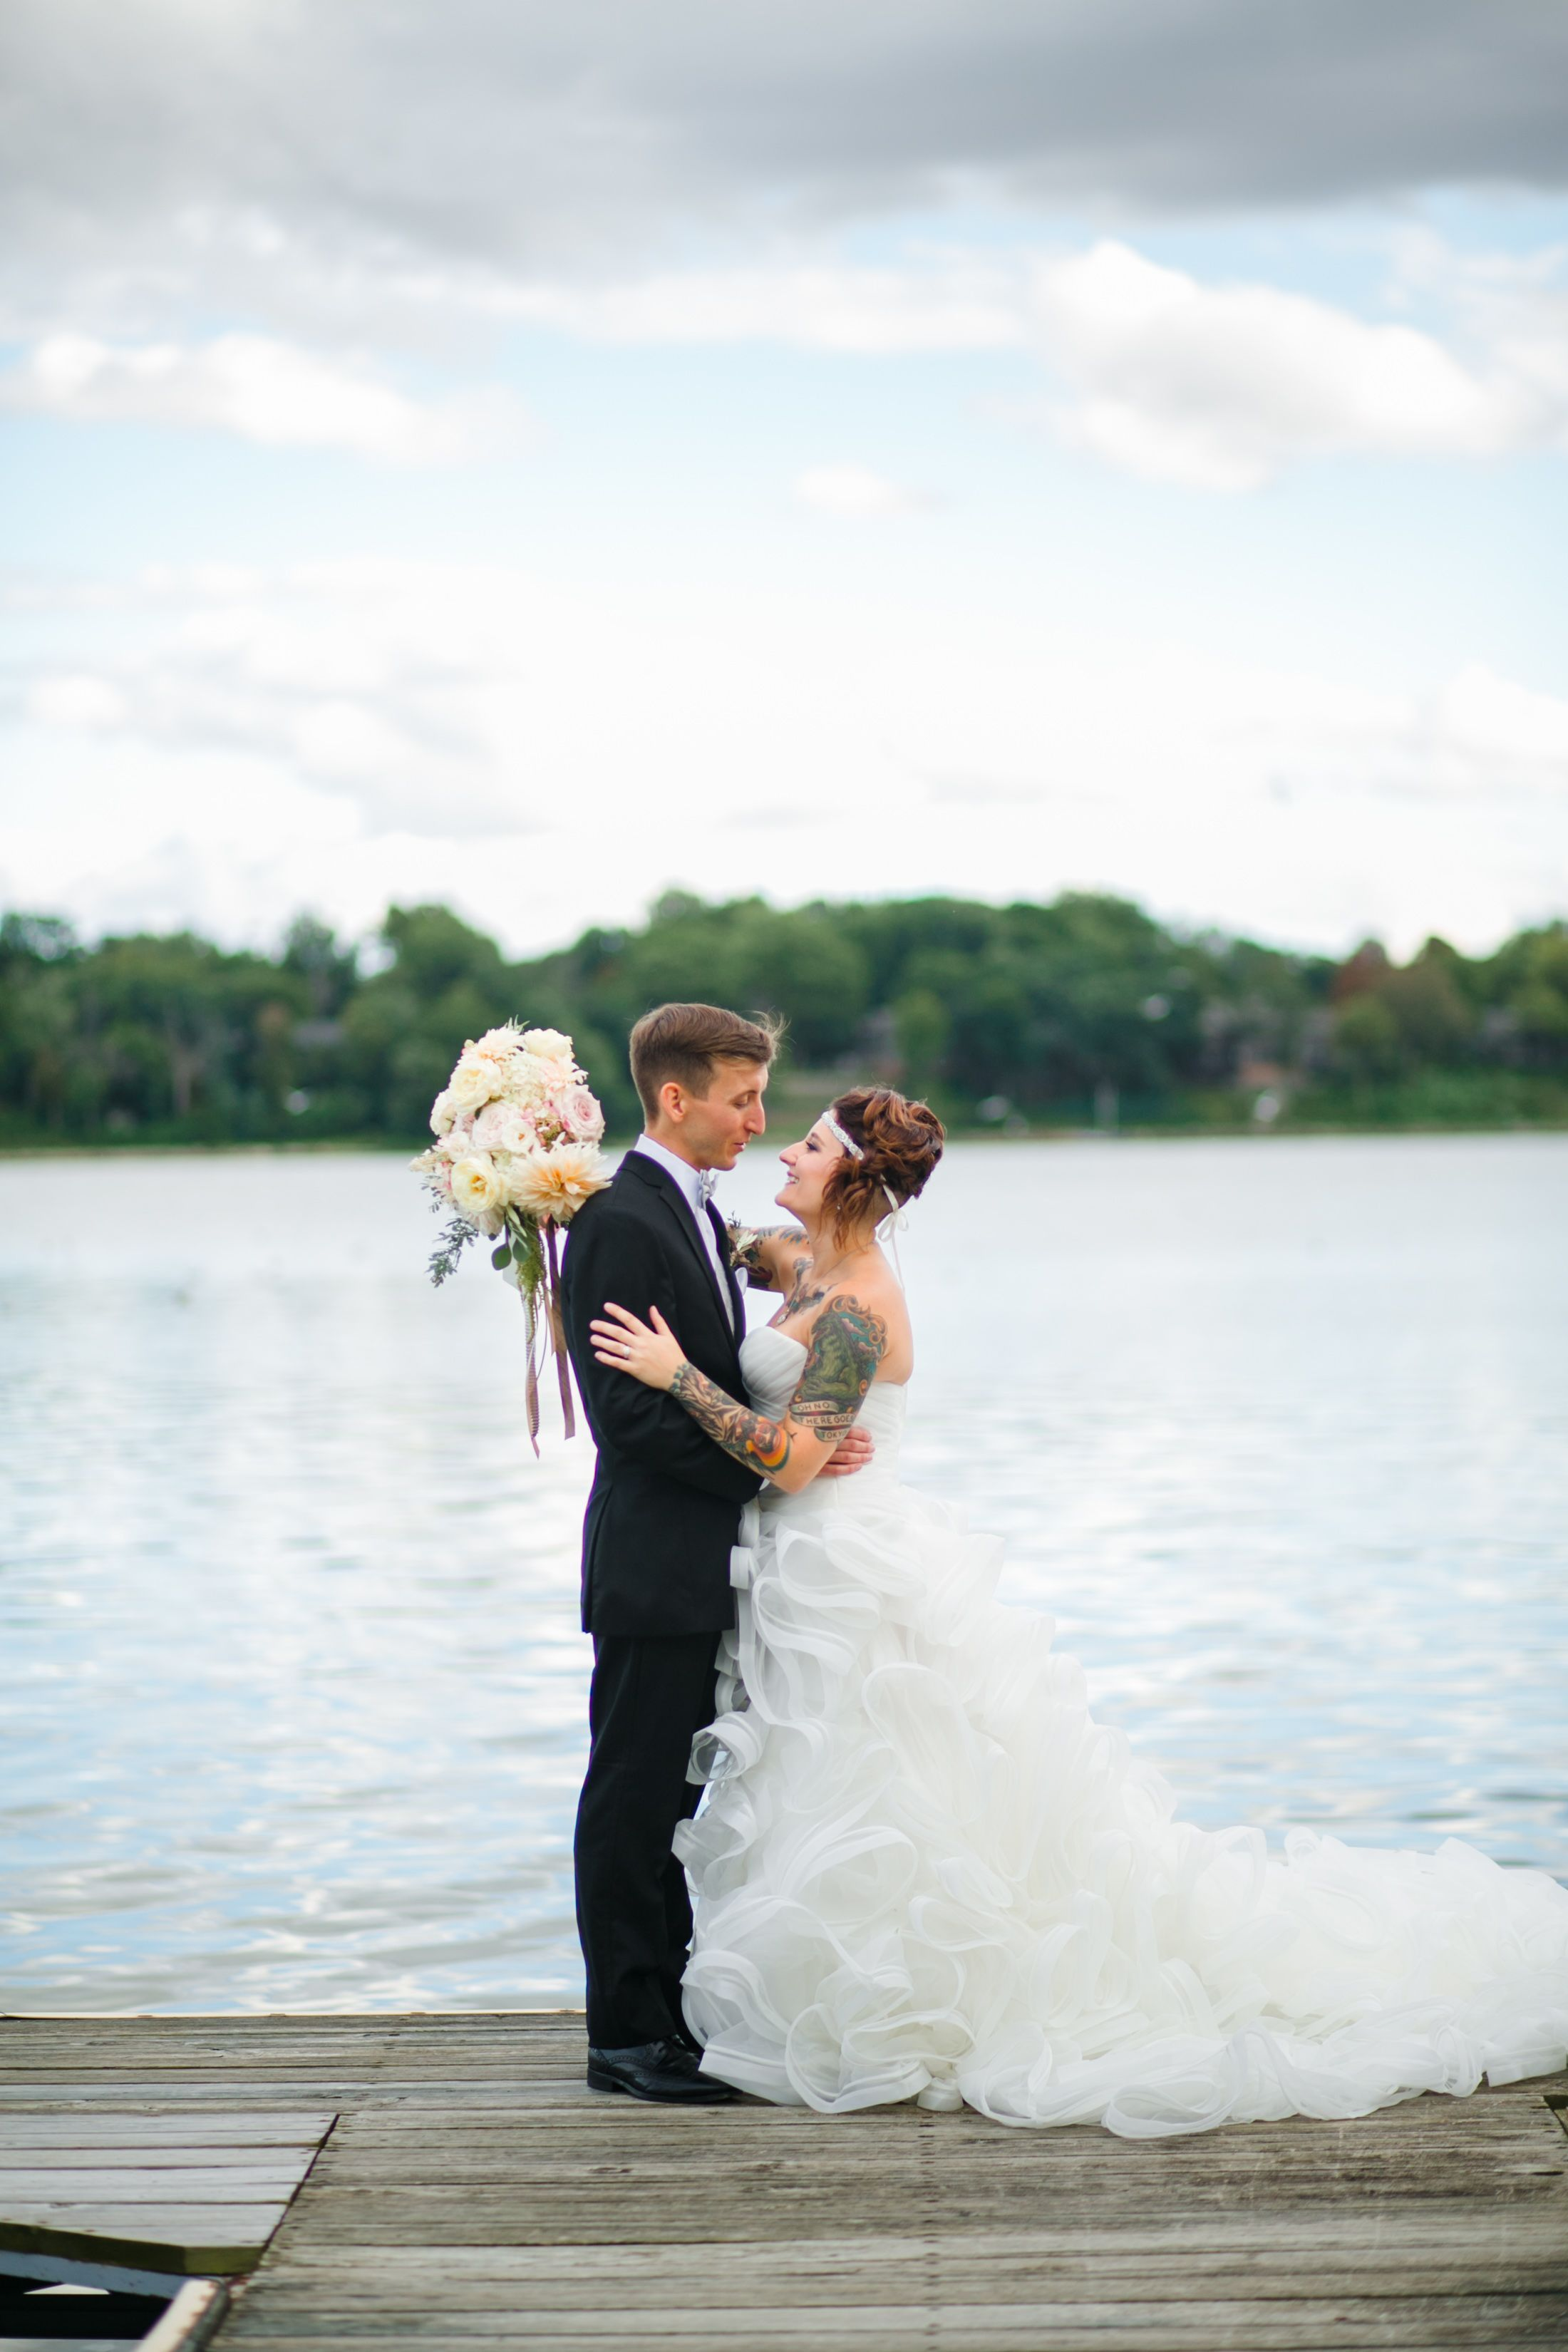 outdoor wedding venues in toledo ohio